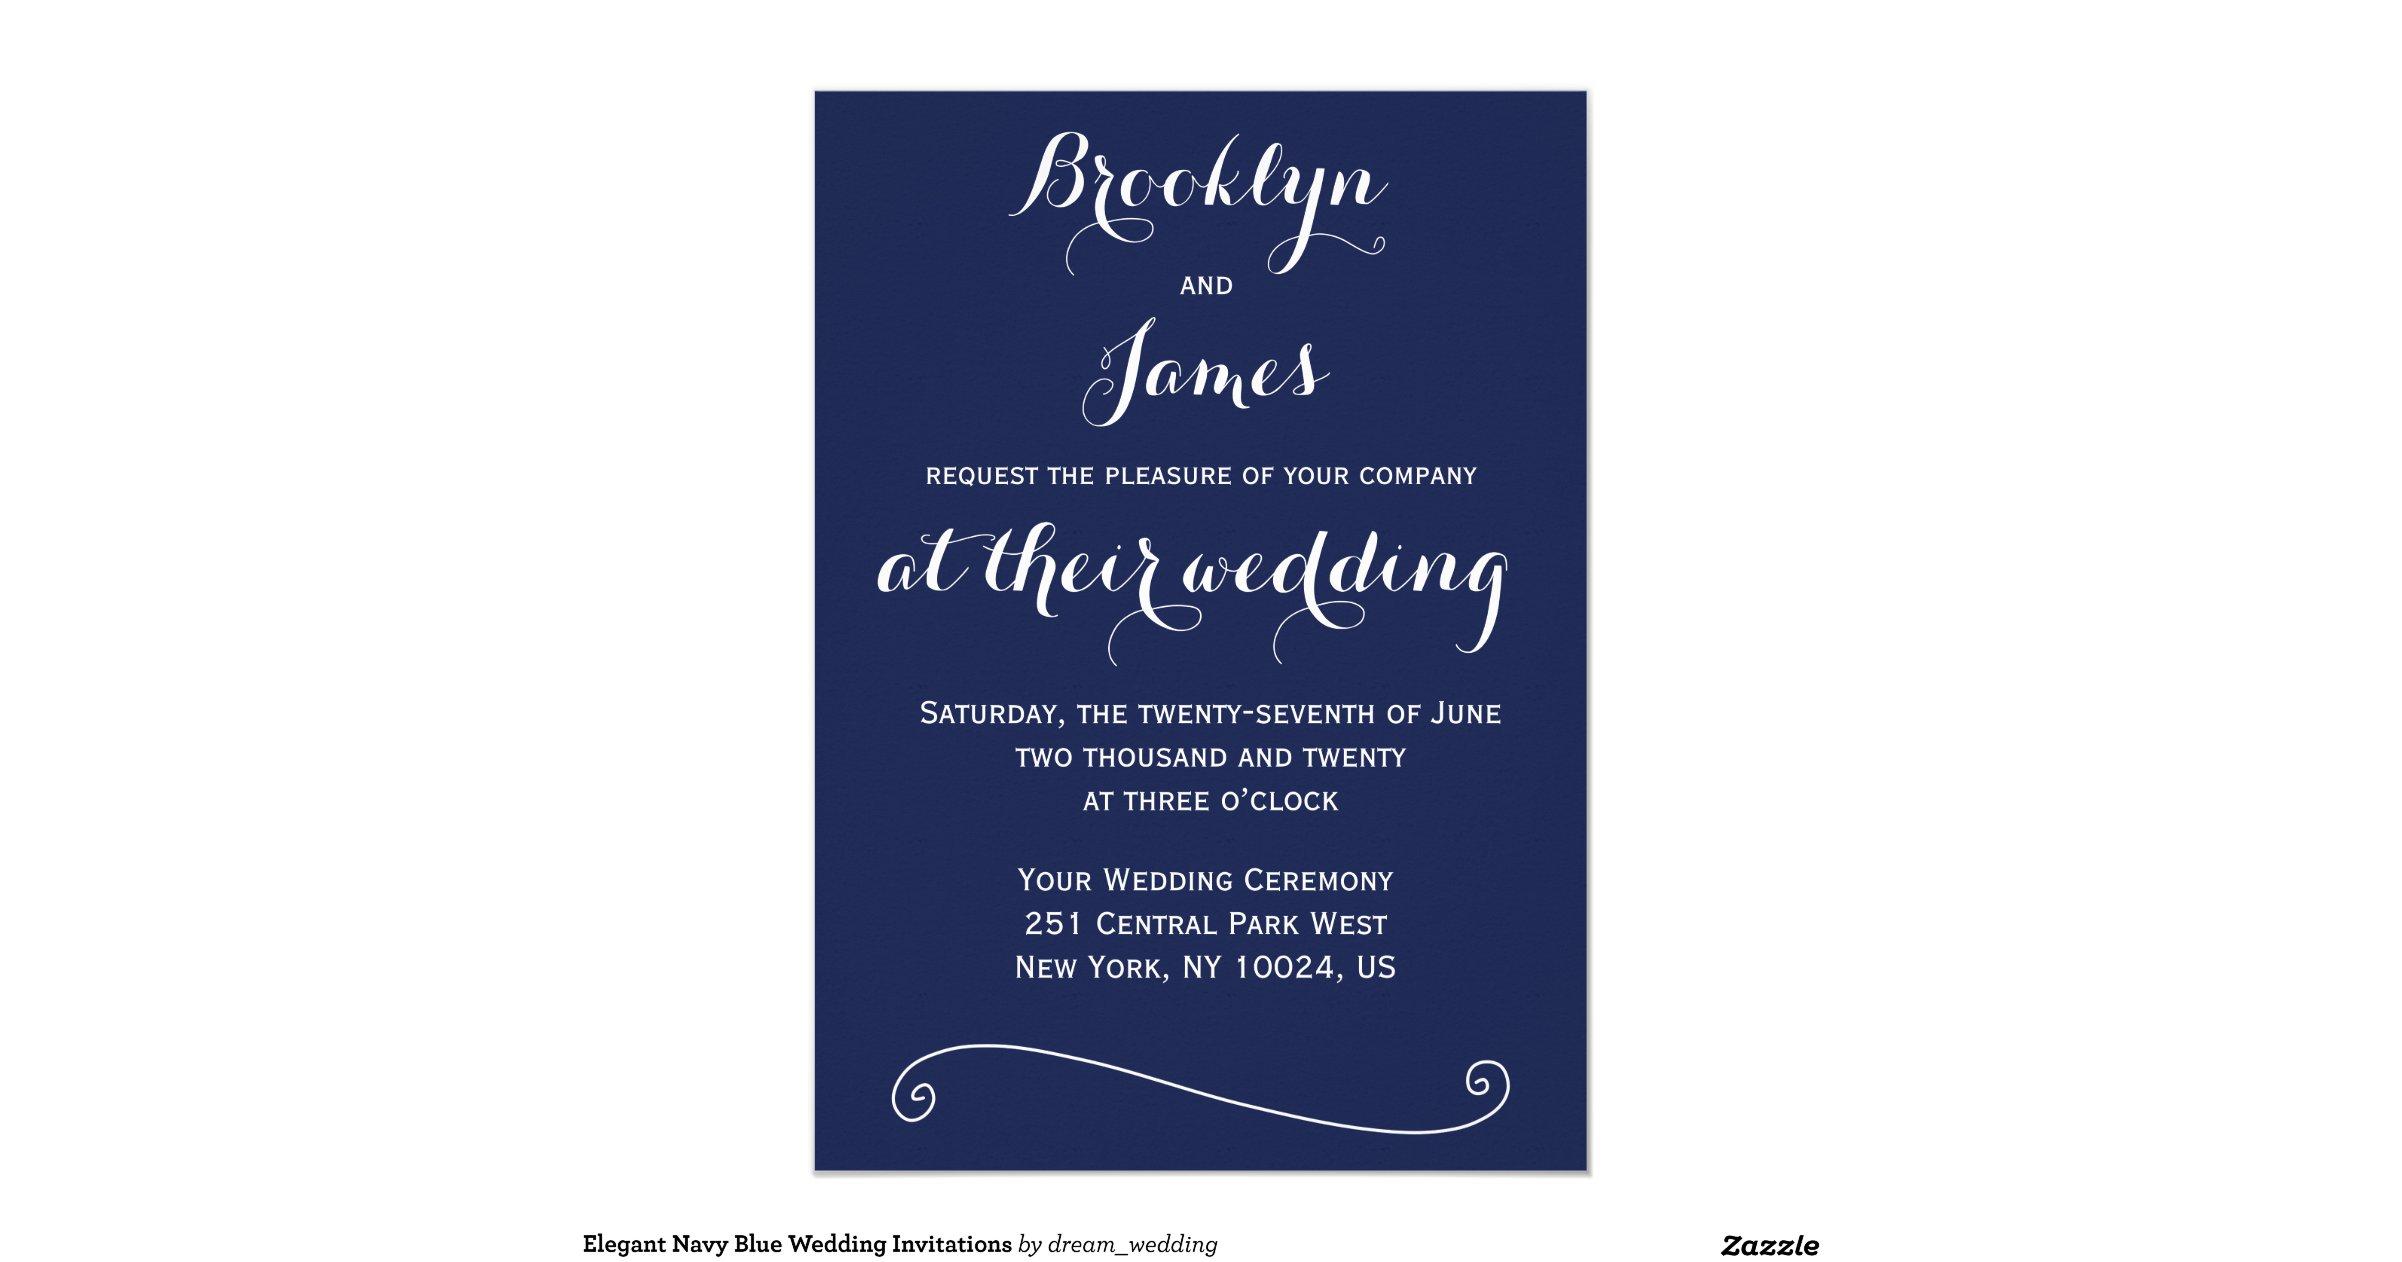 Navy Blue And White Wedding Invitations: Custom_navy_blue_and_white_wedding_invitations